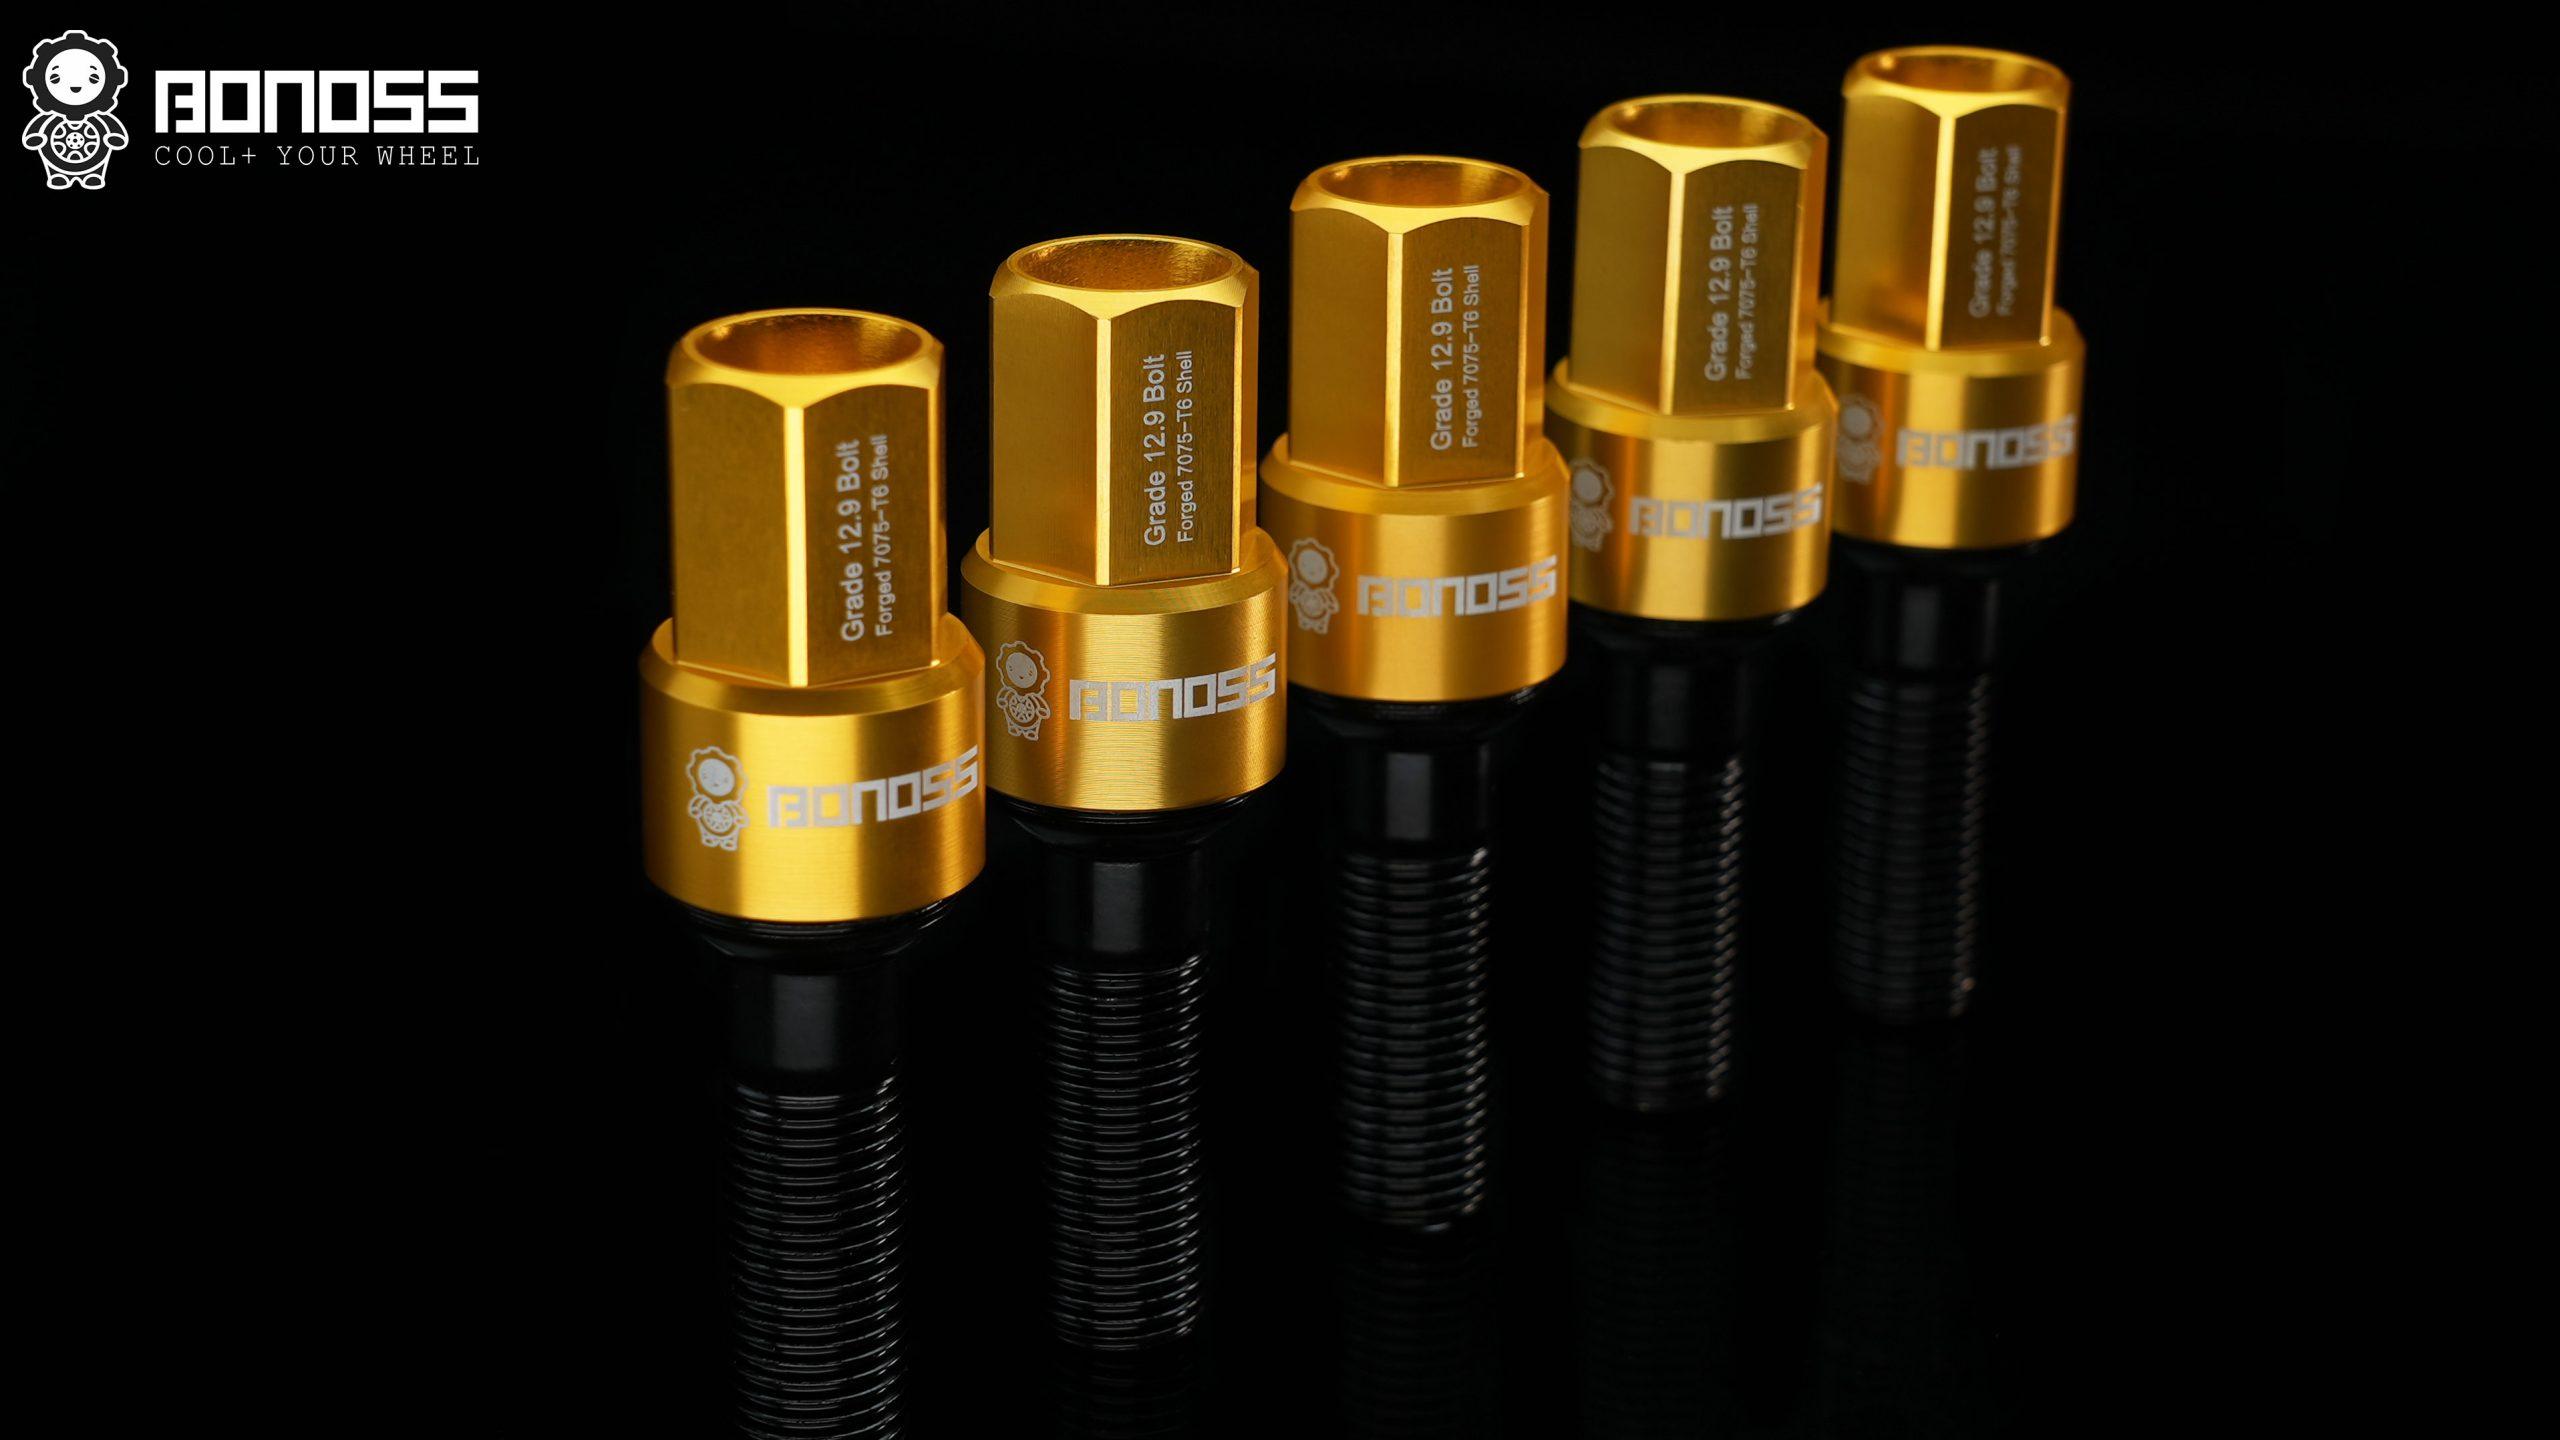 BONOSS shell type lock bolt kit